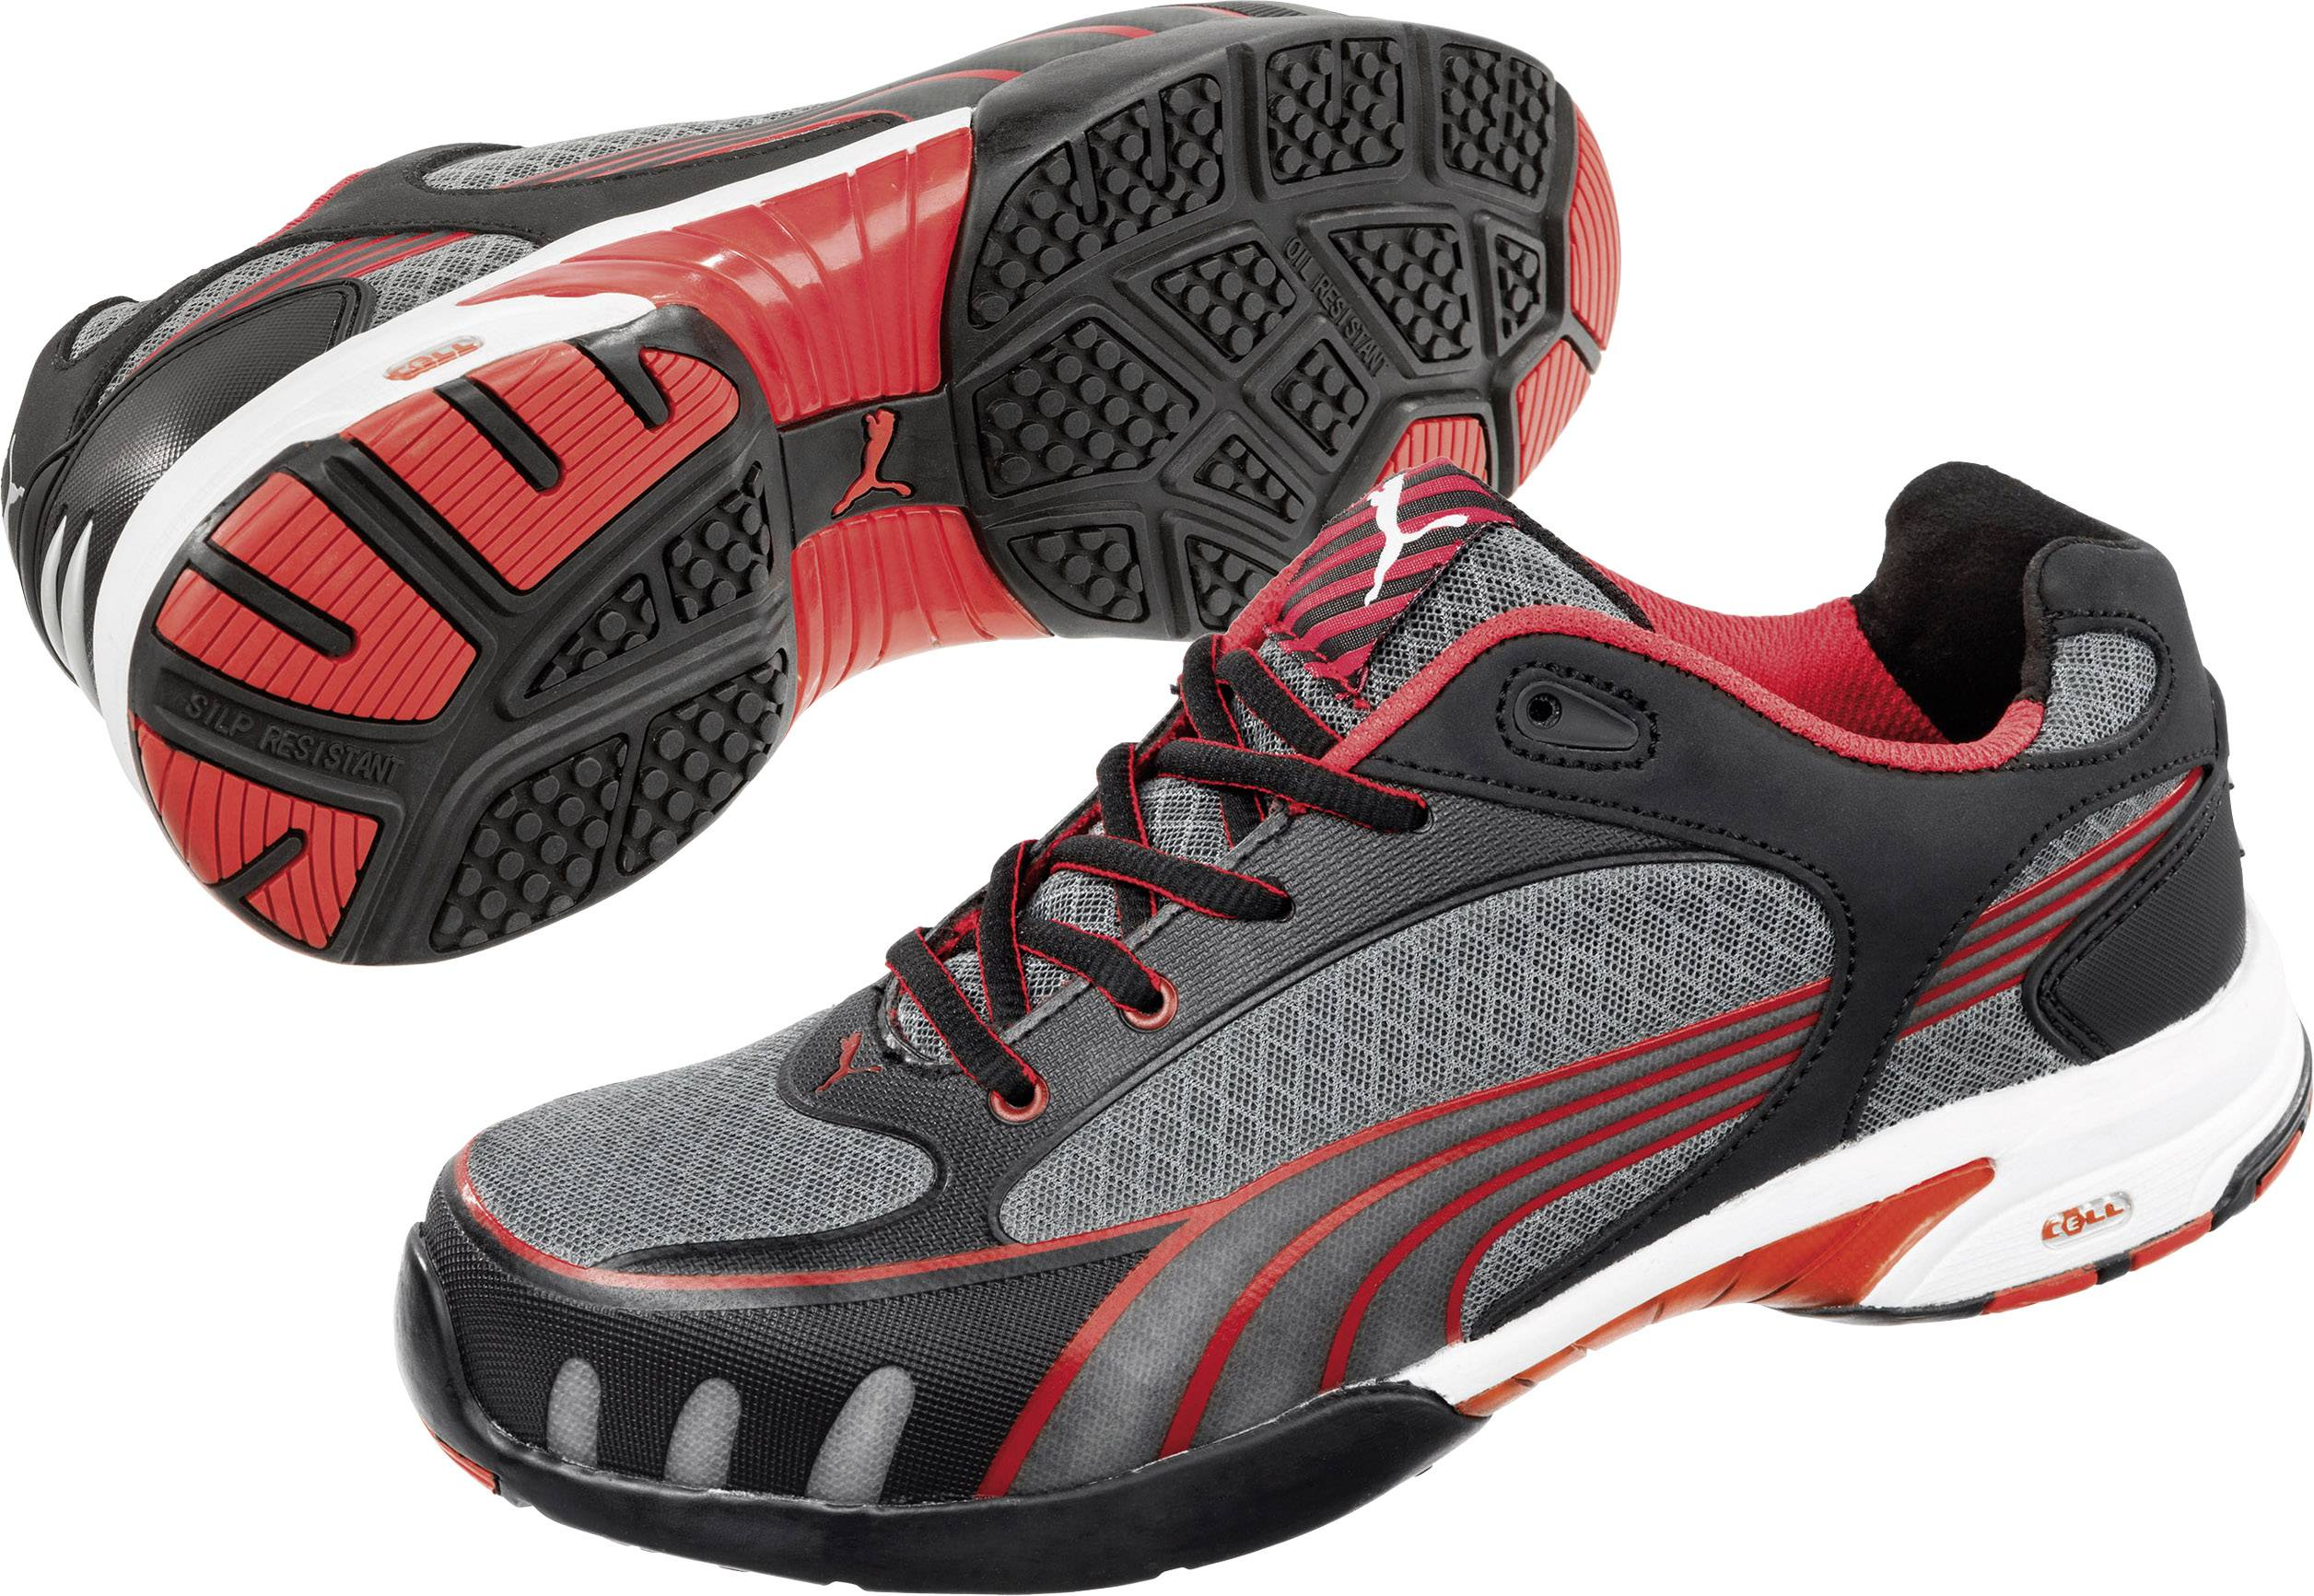 Bezpečnostná obuv S1 PUMA Safety Fuse Motion Red Wns Low 642870, veľ.: 37, čierna, červená, 1 pár